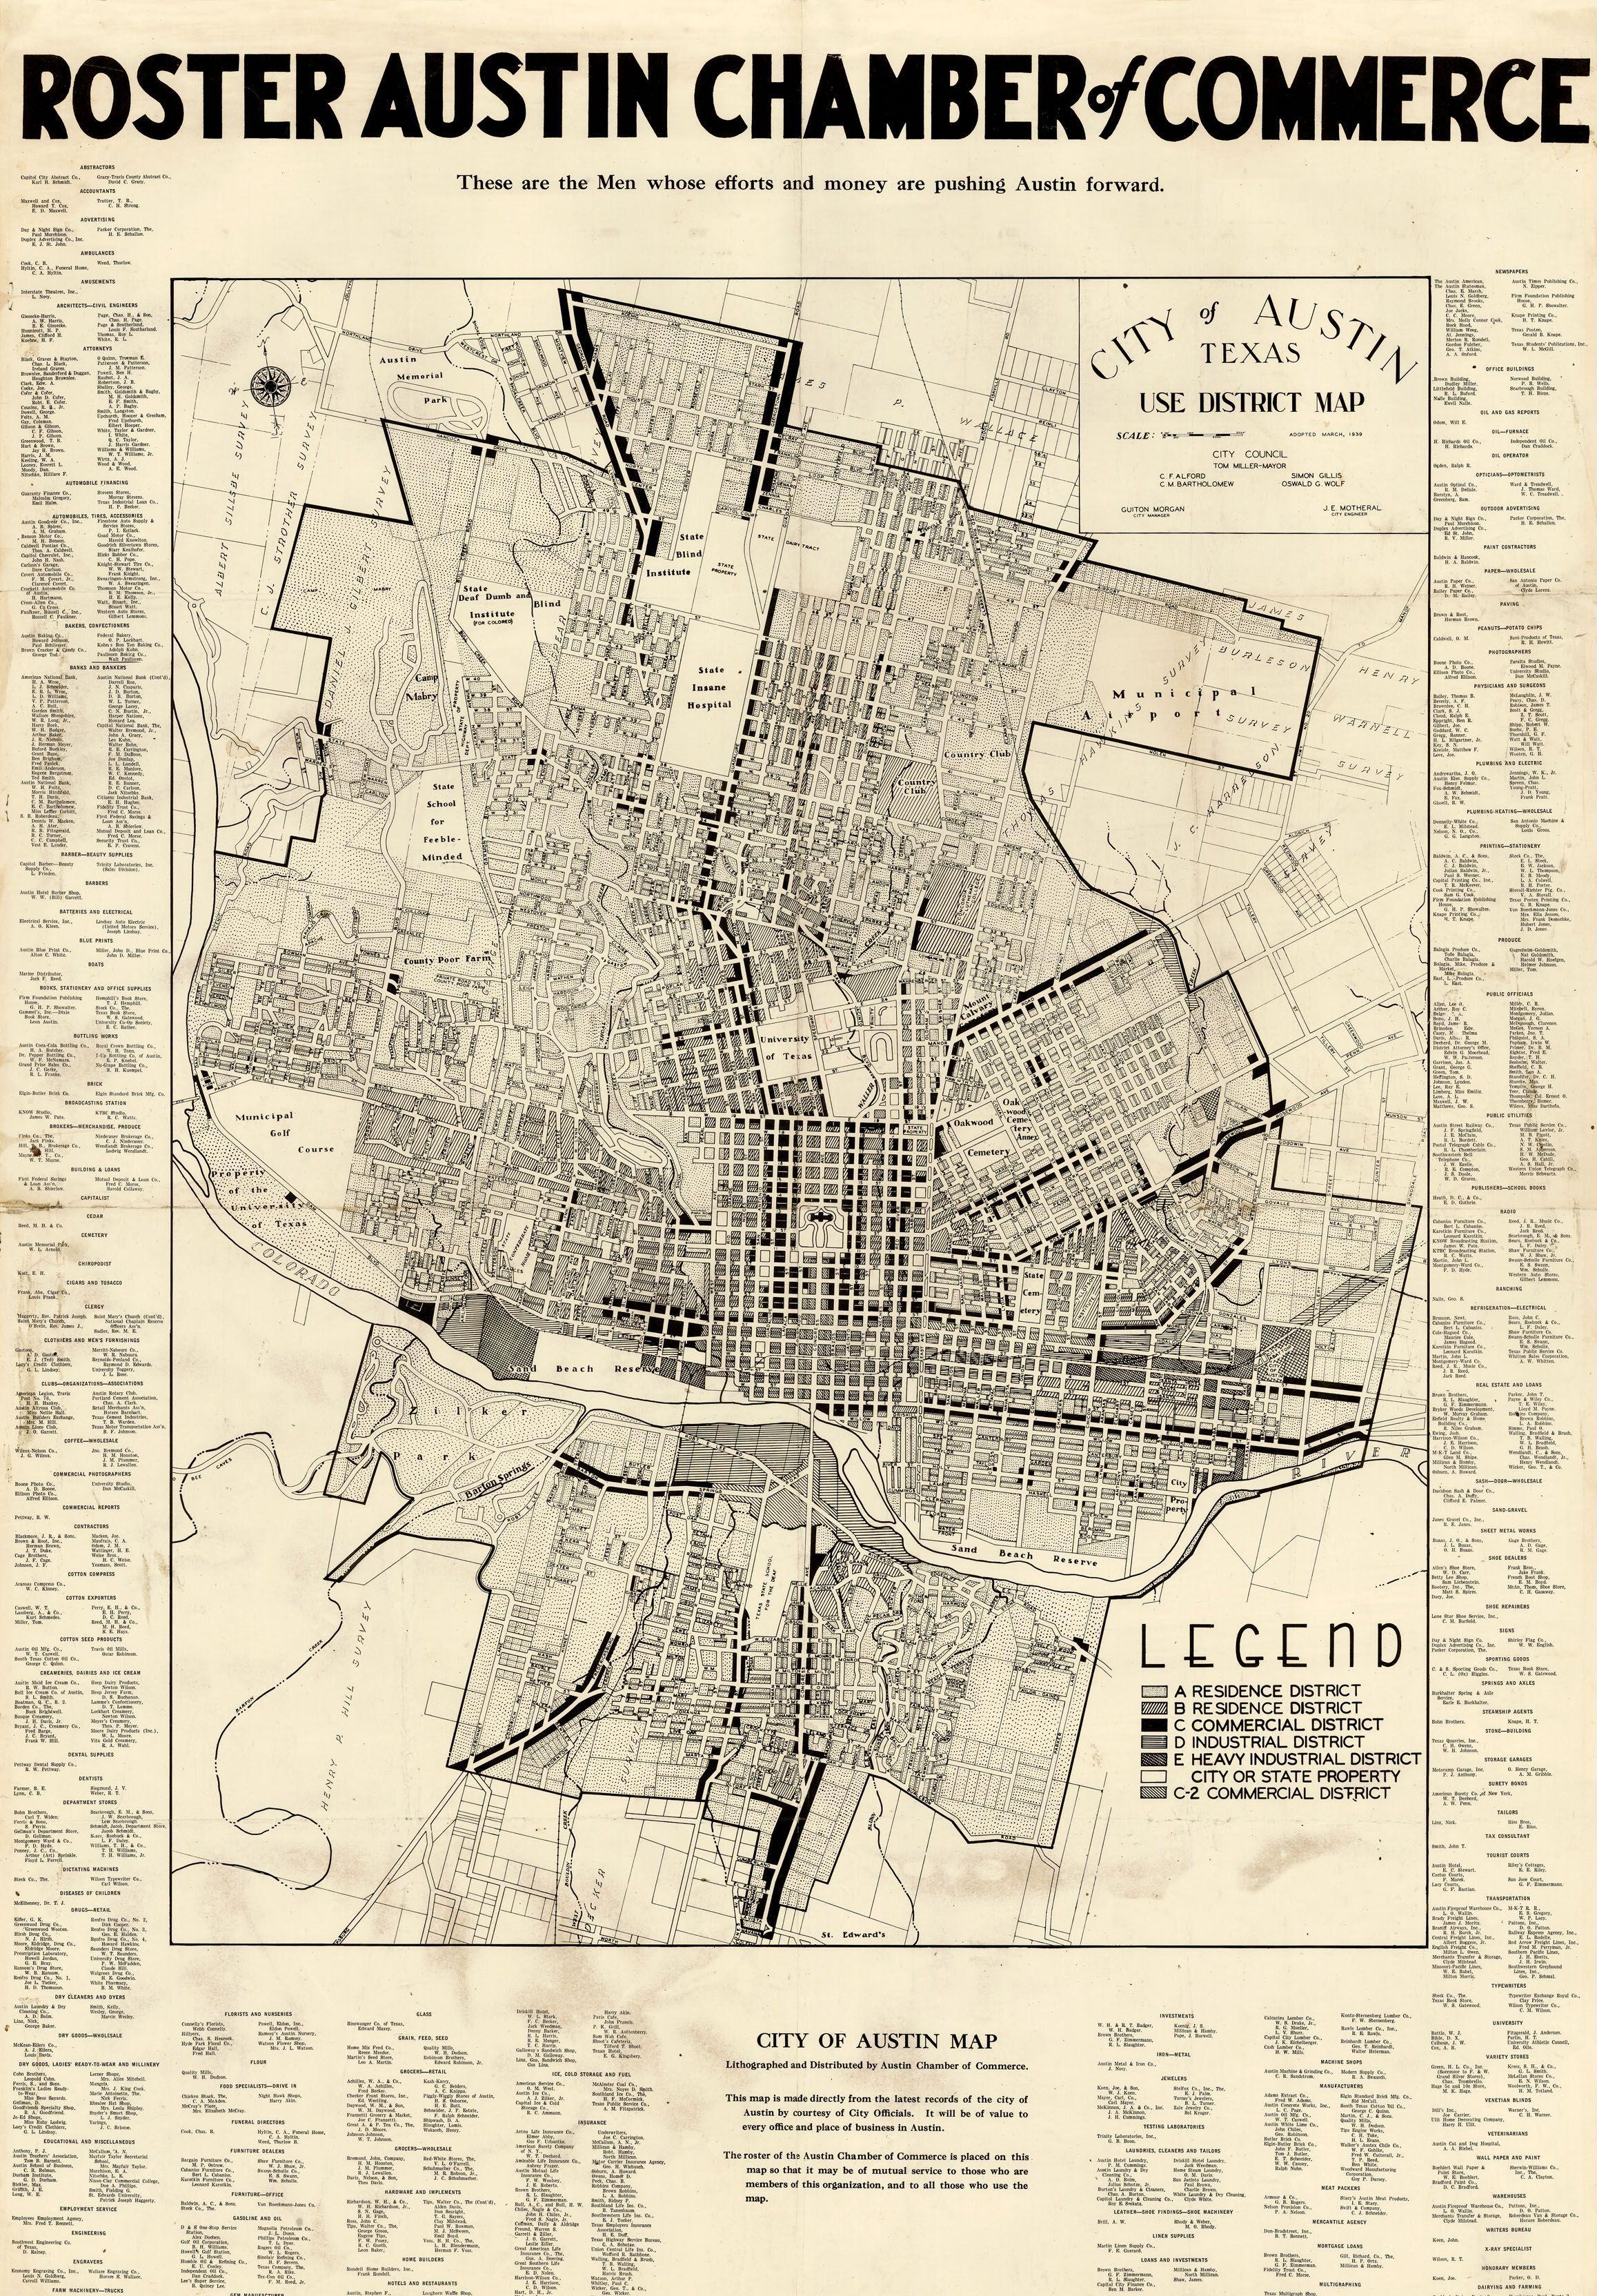 City of Austin Map 1939